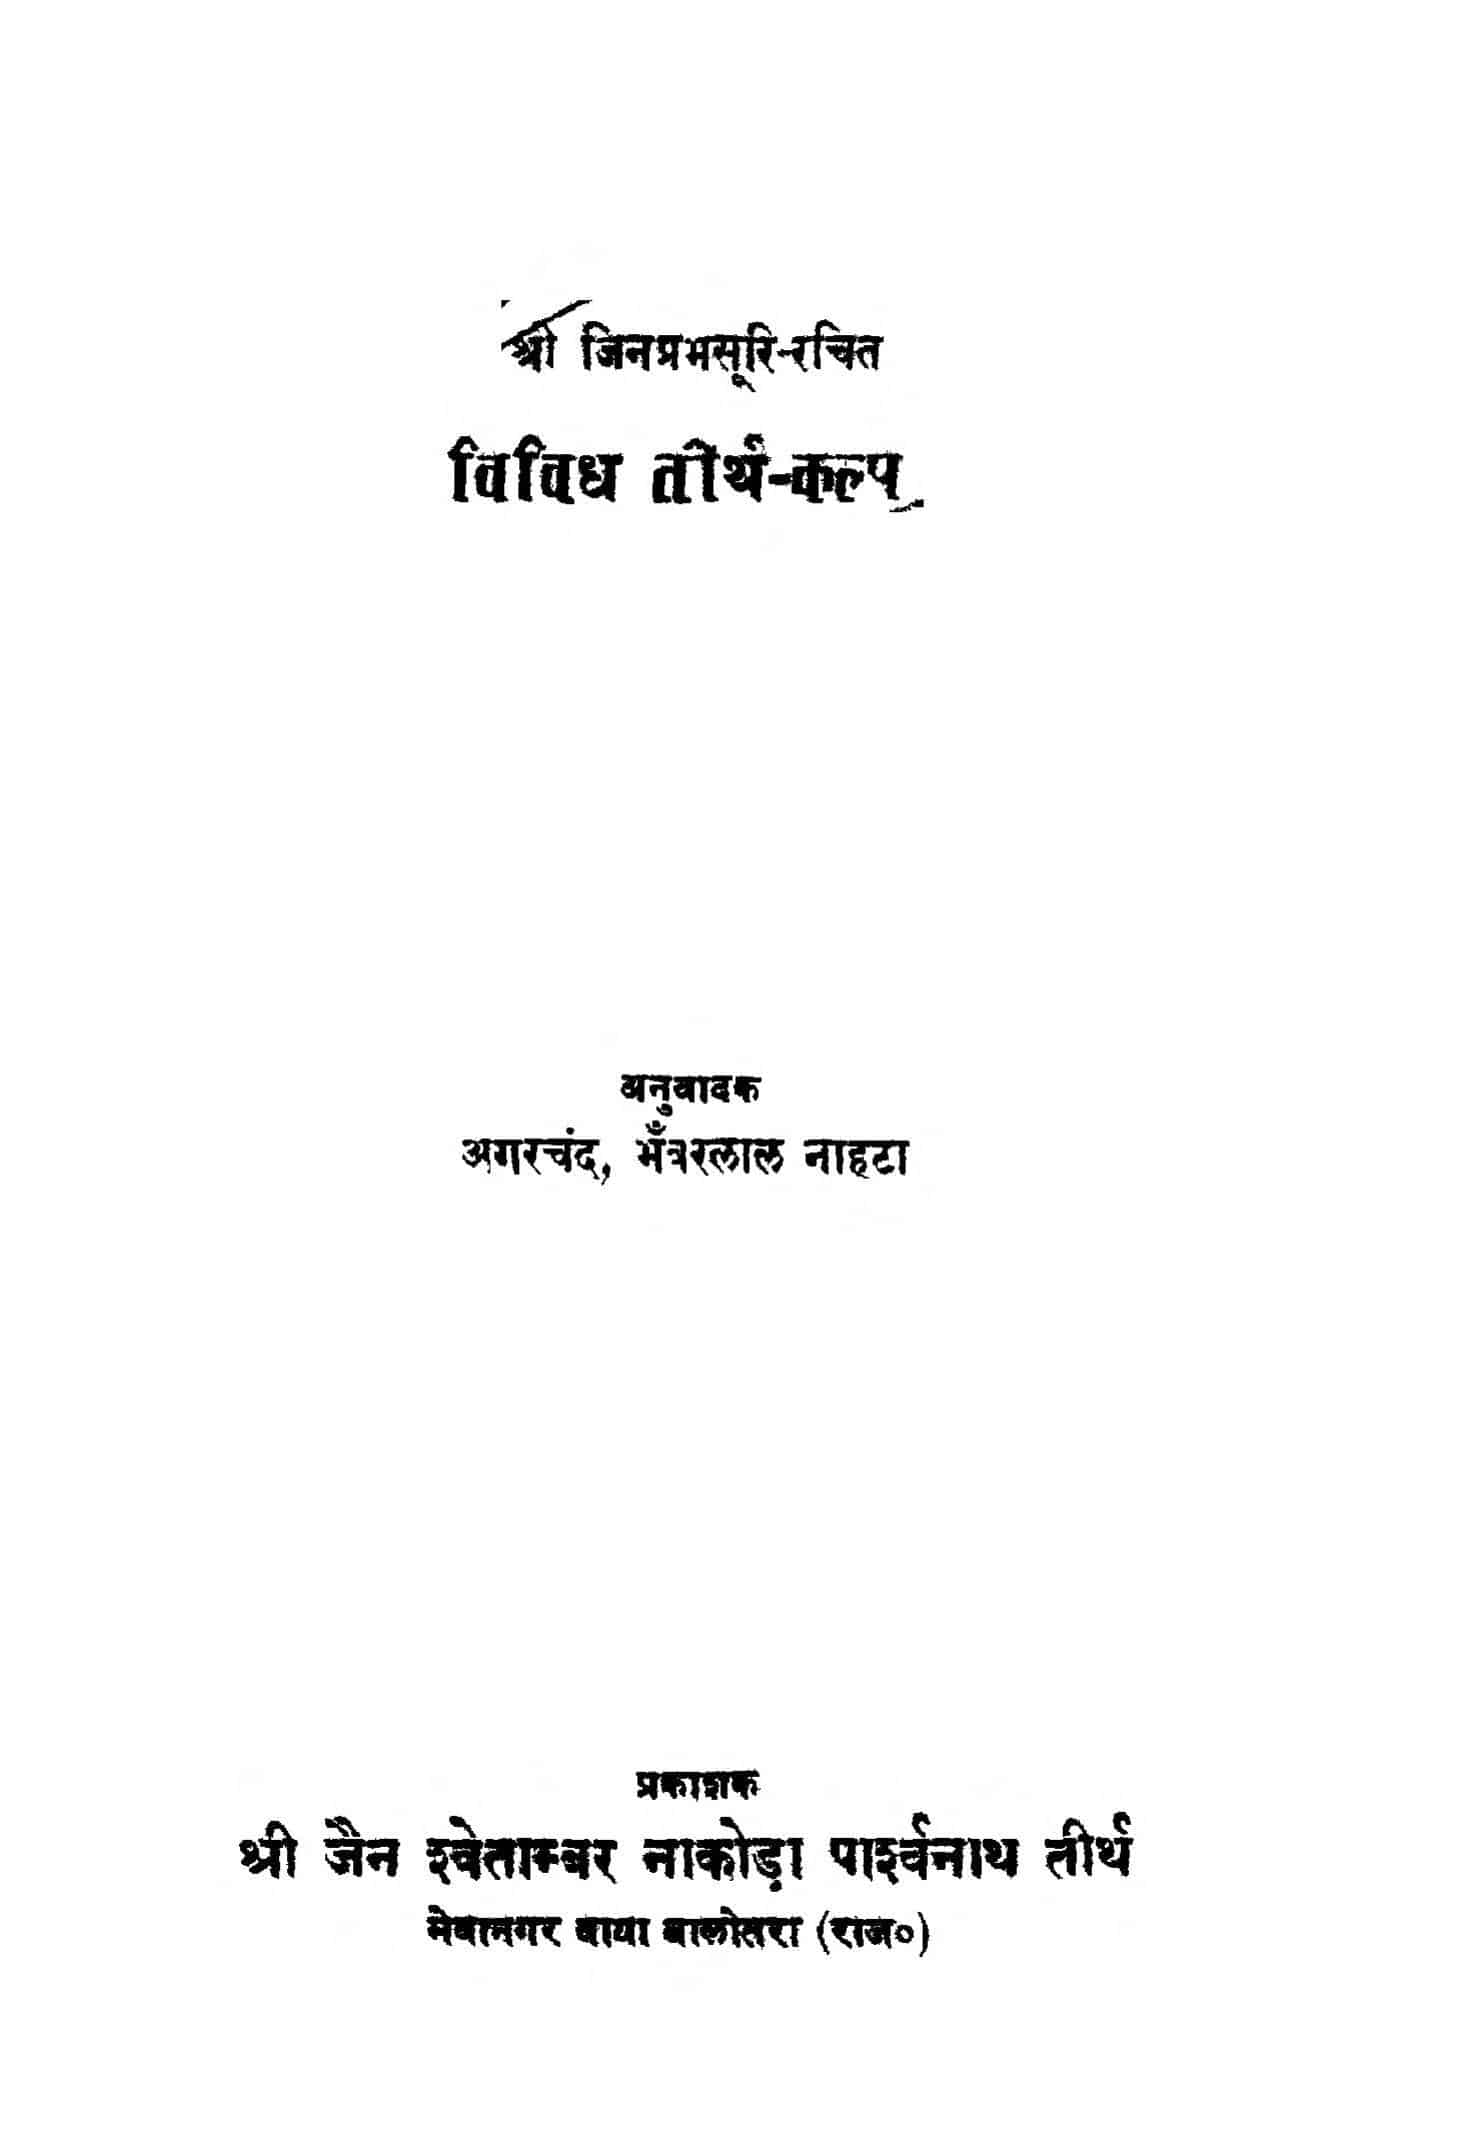 Vividha Tirth Kalp by अगरचंद नाहटा - Agarchand Nahtaभँवरलाल नाहटा - Bhanvarlal Nahtaश्री जिनप्रभसूरि - Shri Jinaprabhasuri